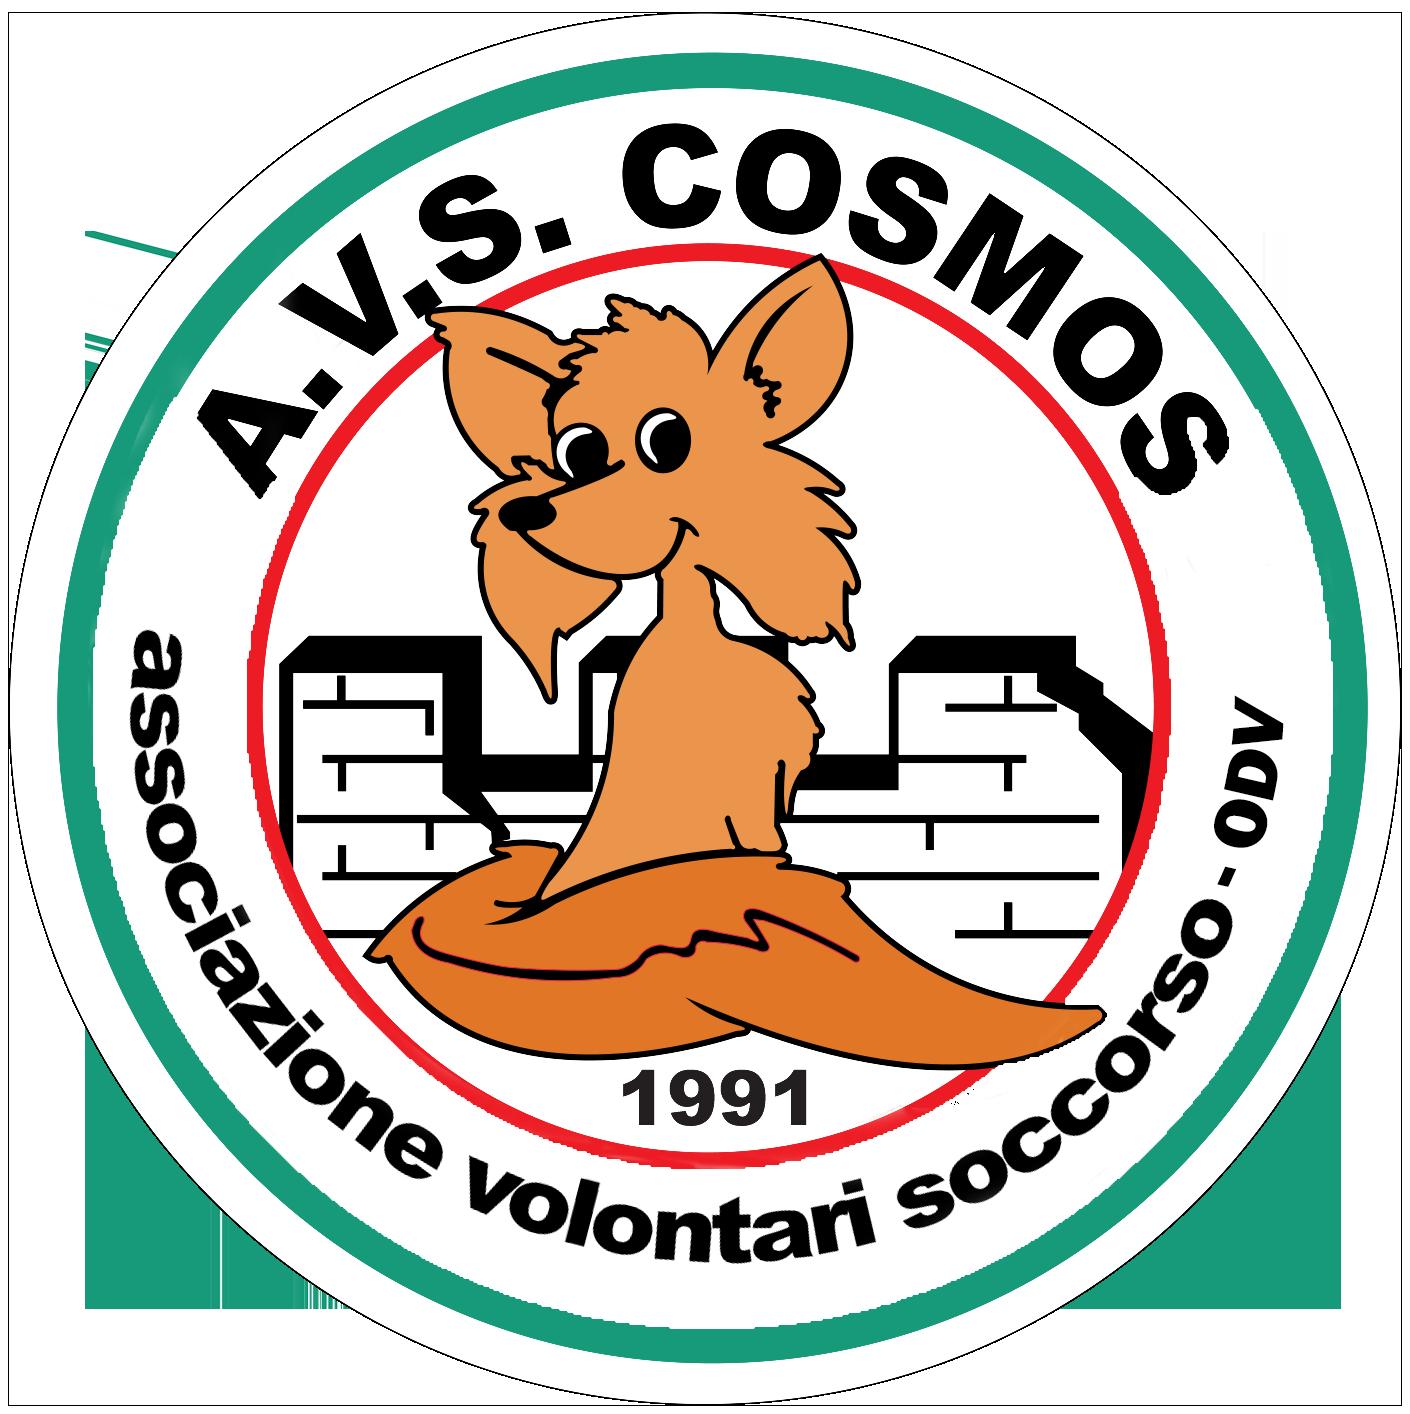 A.V.S. COSMOS – Associazione Volontari Soccorso – ODV